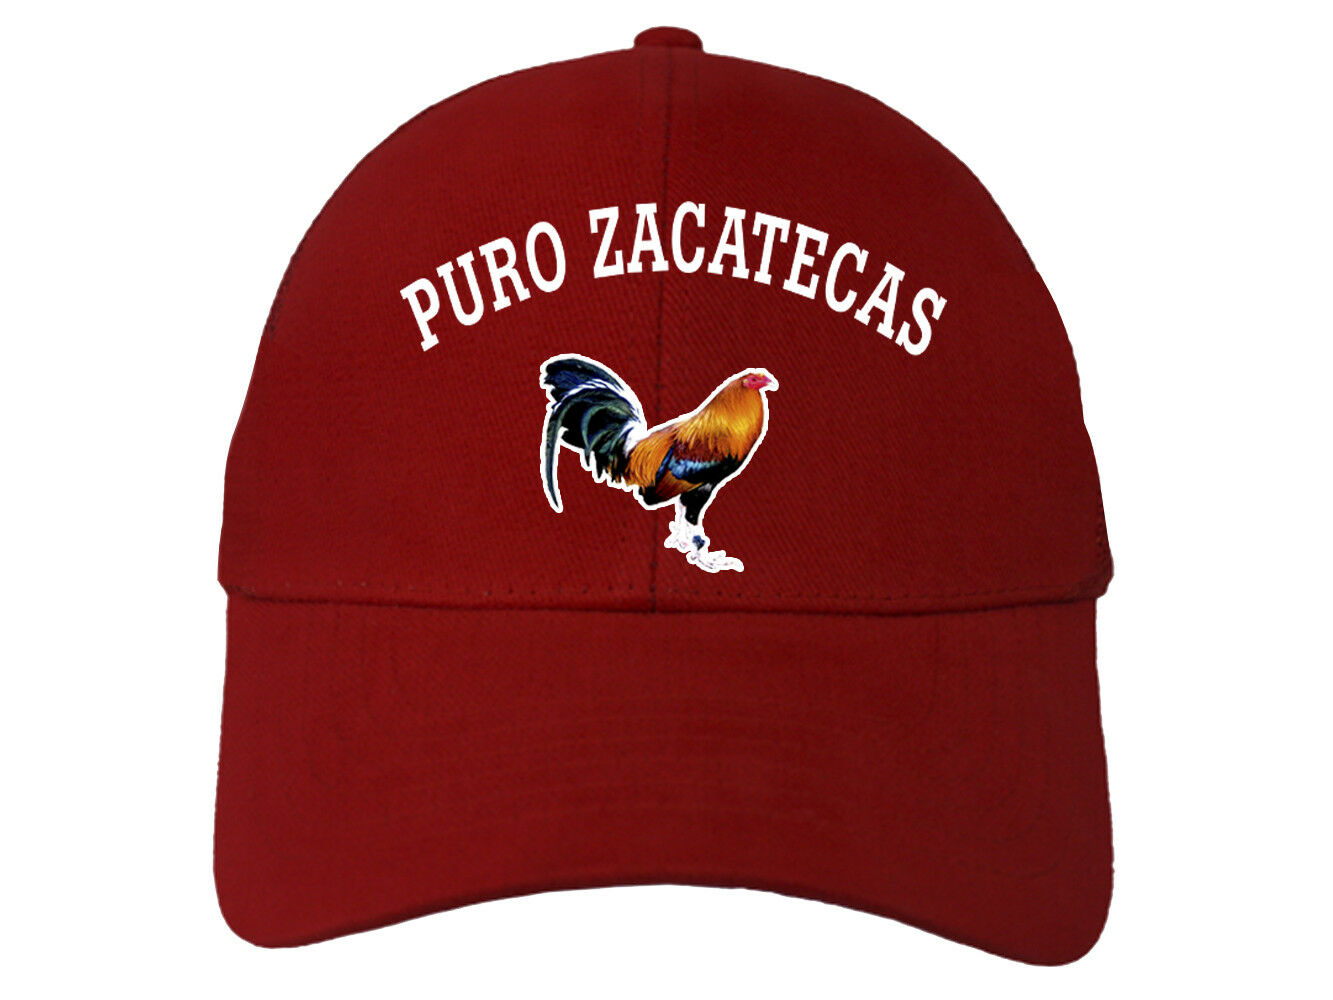 Cap Hat Puro Zacatecas/_ Adjustable Strap/_ 100/% Cotton/_Digital Transfer Logo/_